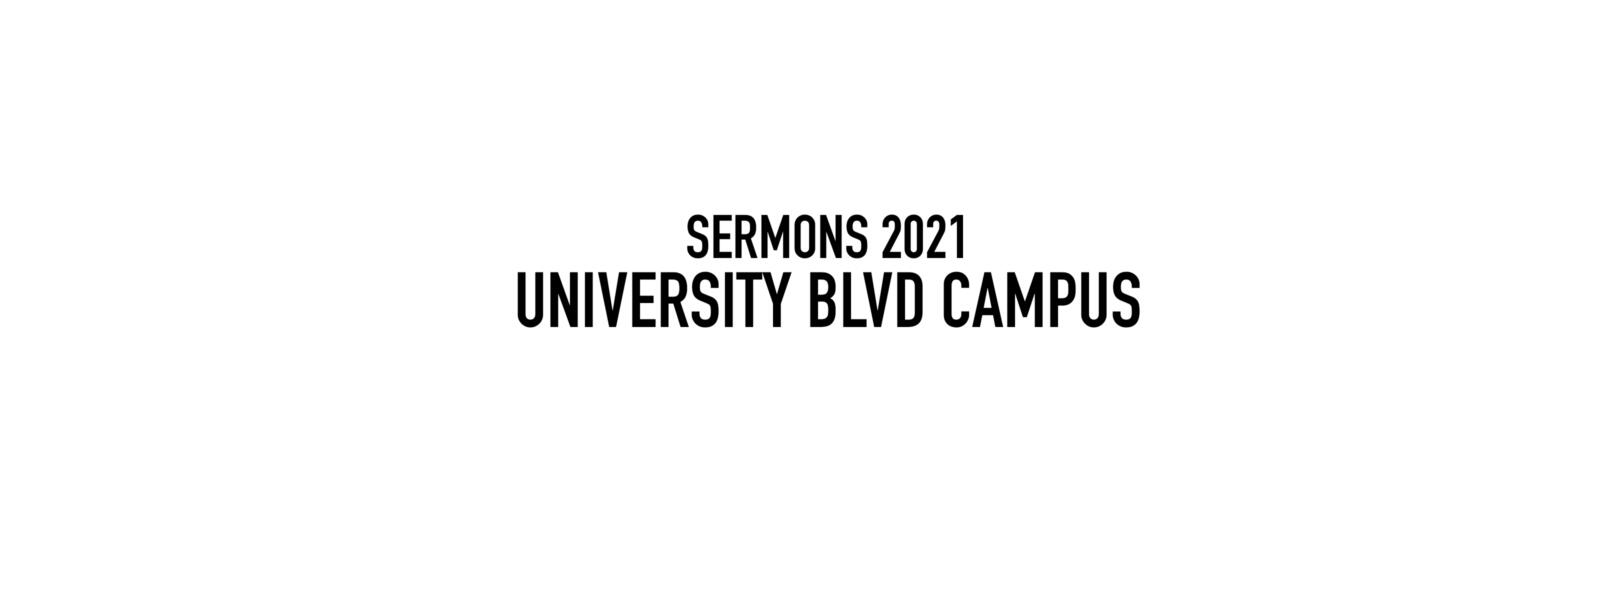 Sermon Series 2021 University Blvd